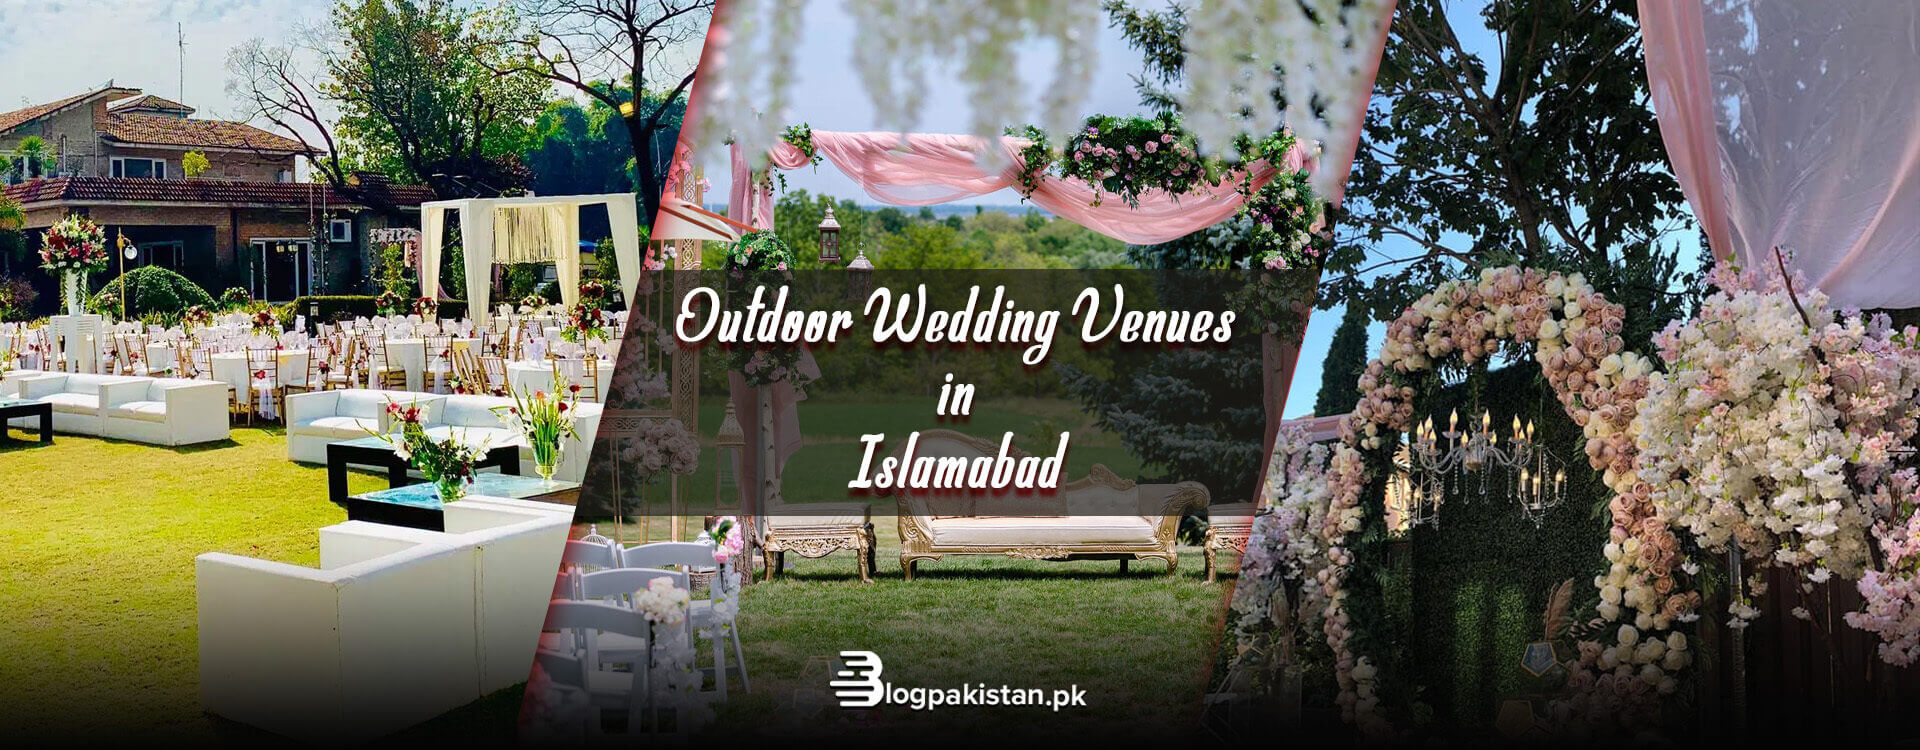 outdoor wedding venues in Islamabad